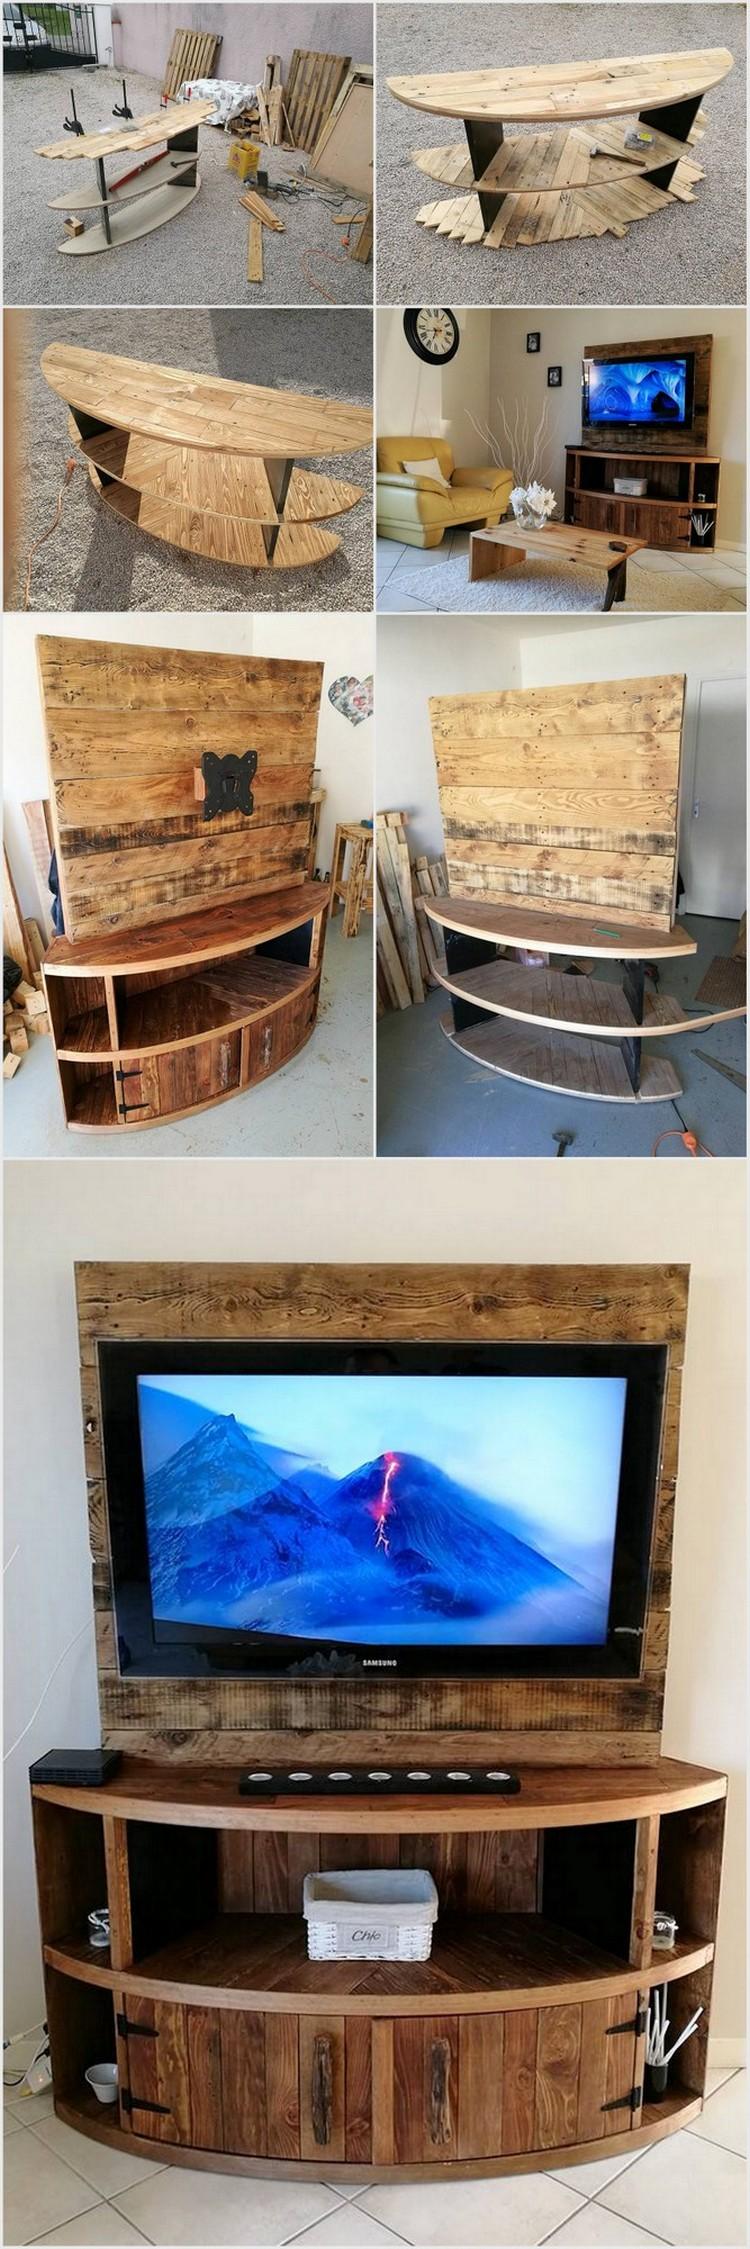 DIY Wood Pallet Entertainment Center – TV Stand